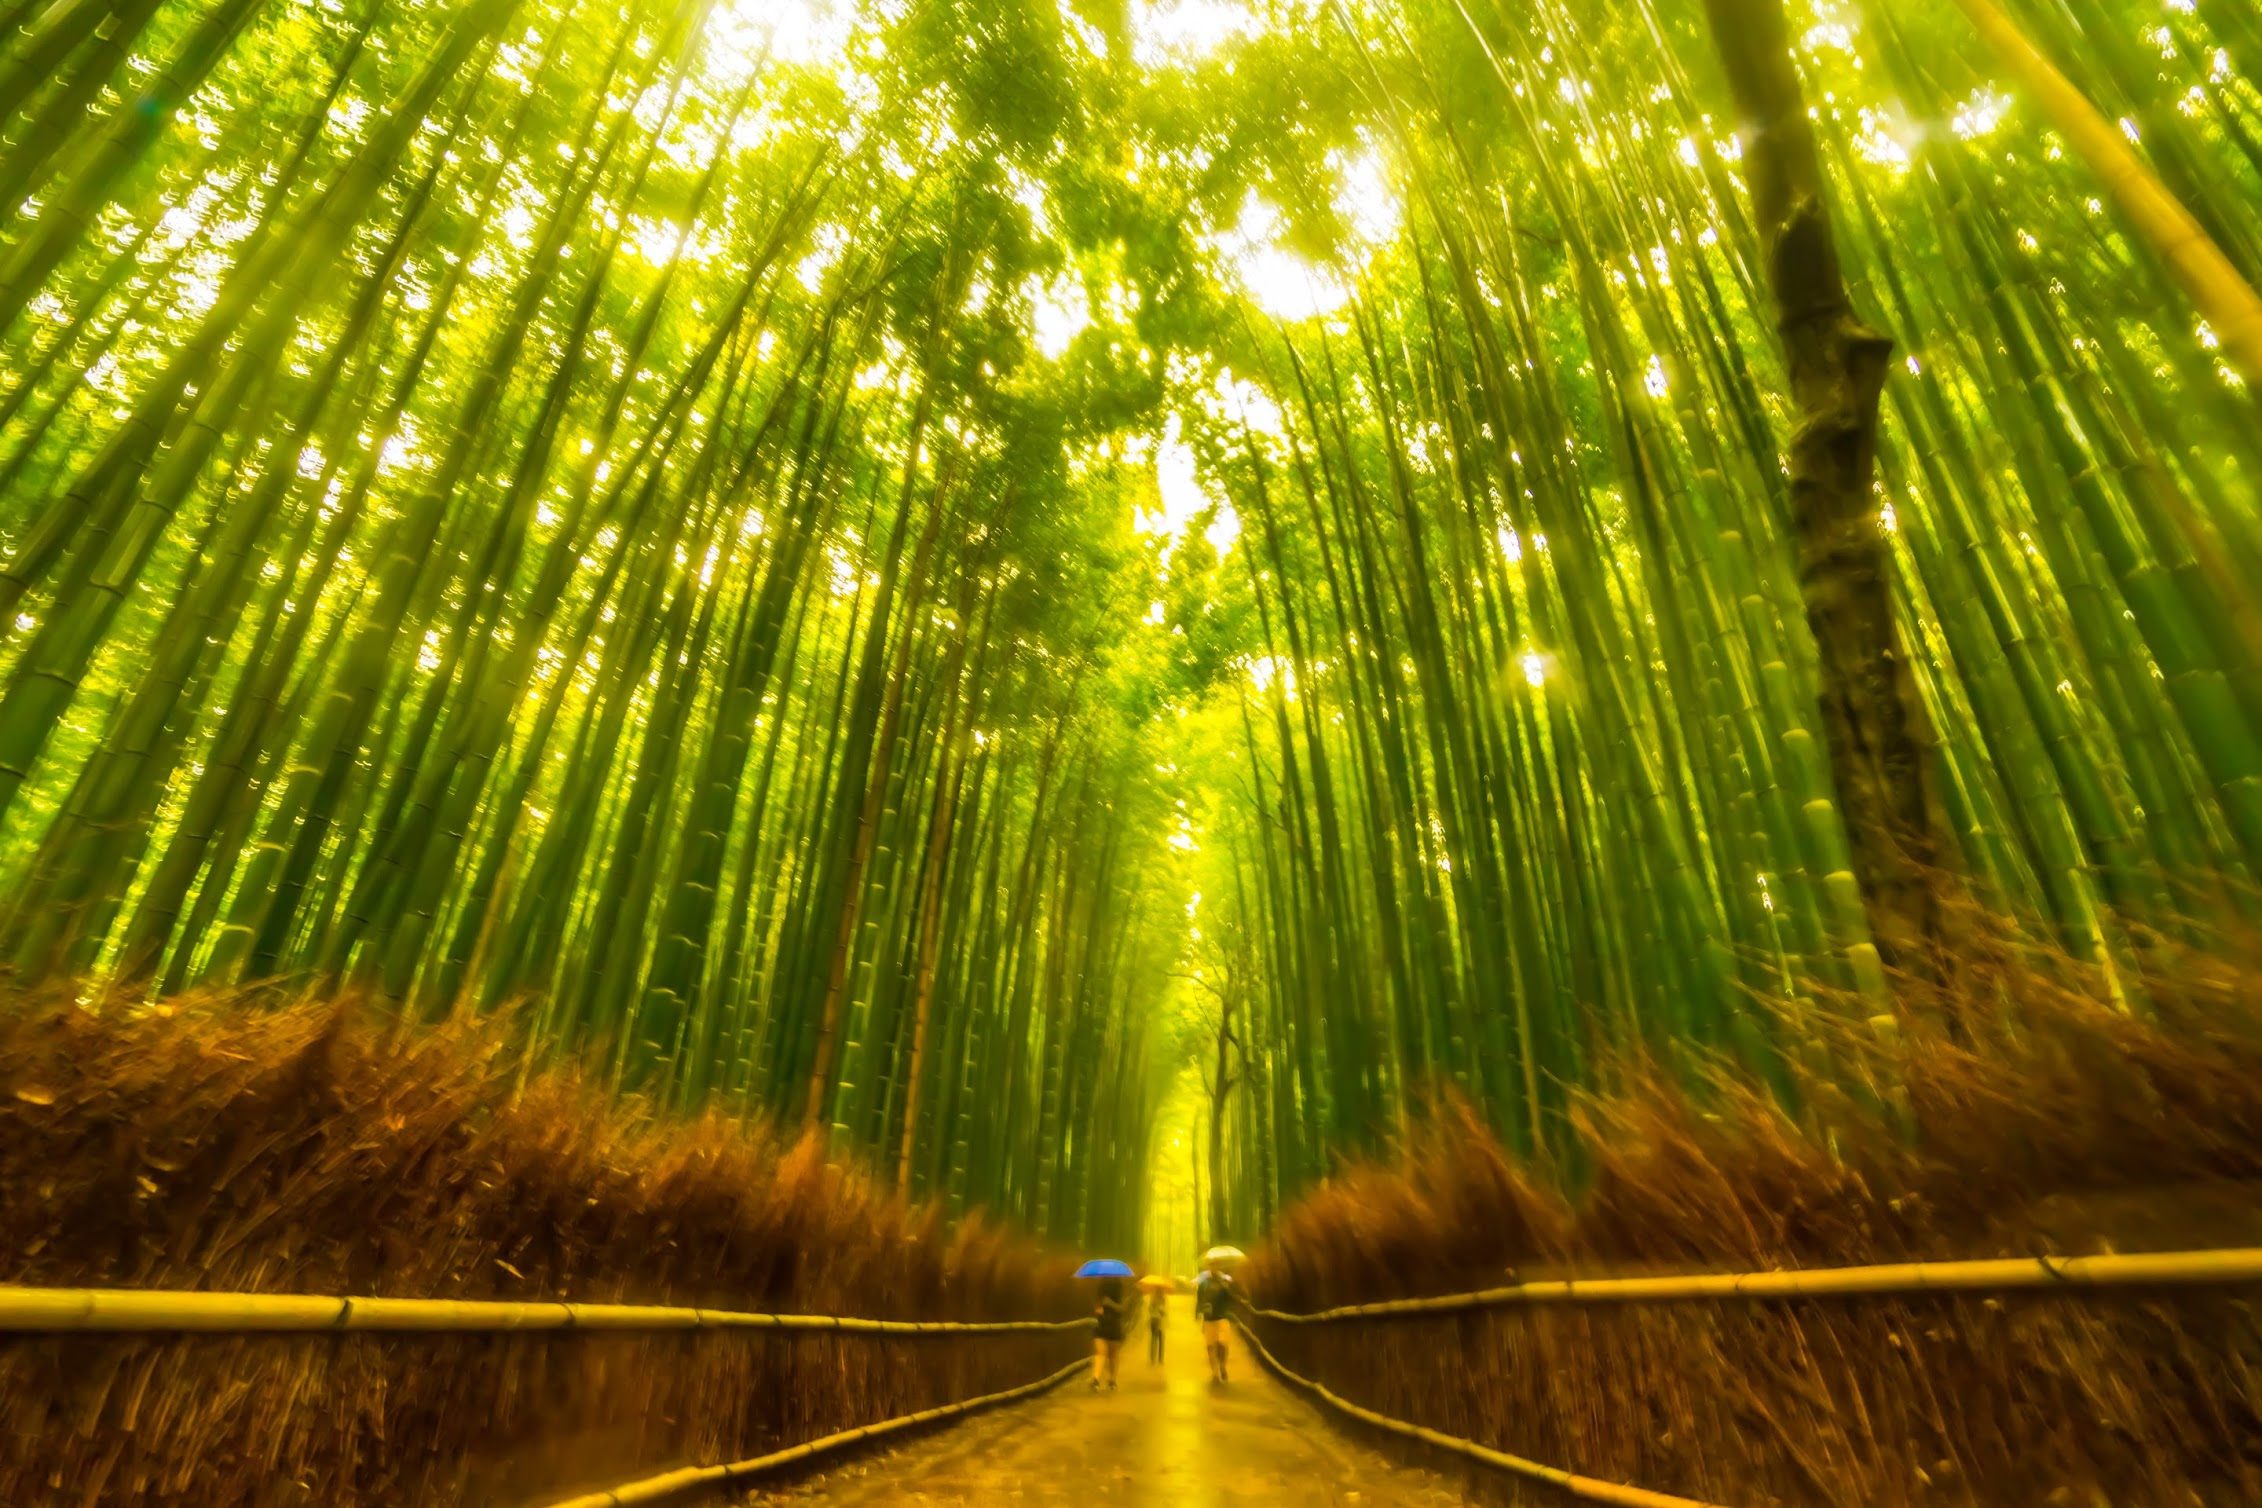 Kyoto Bamboo grove2